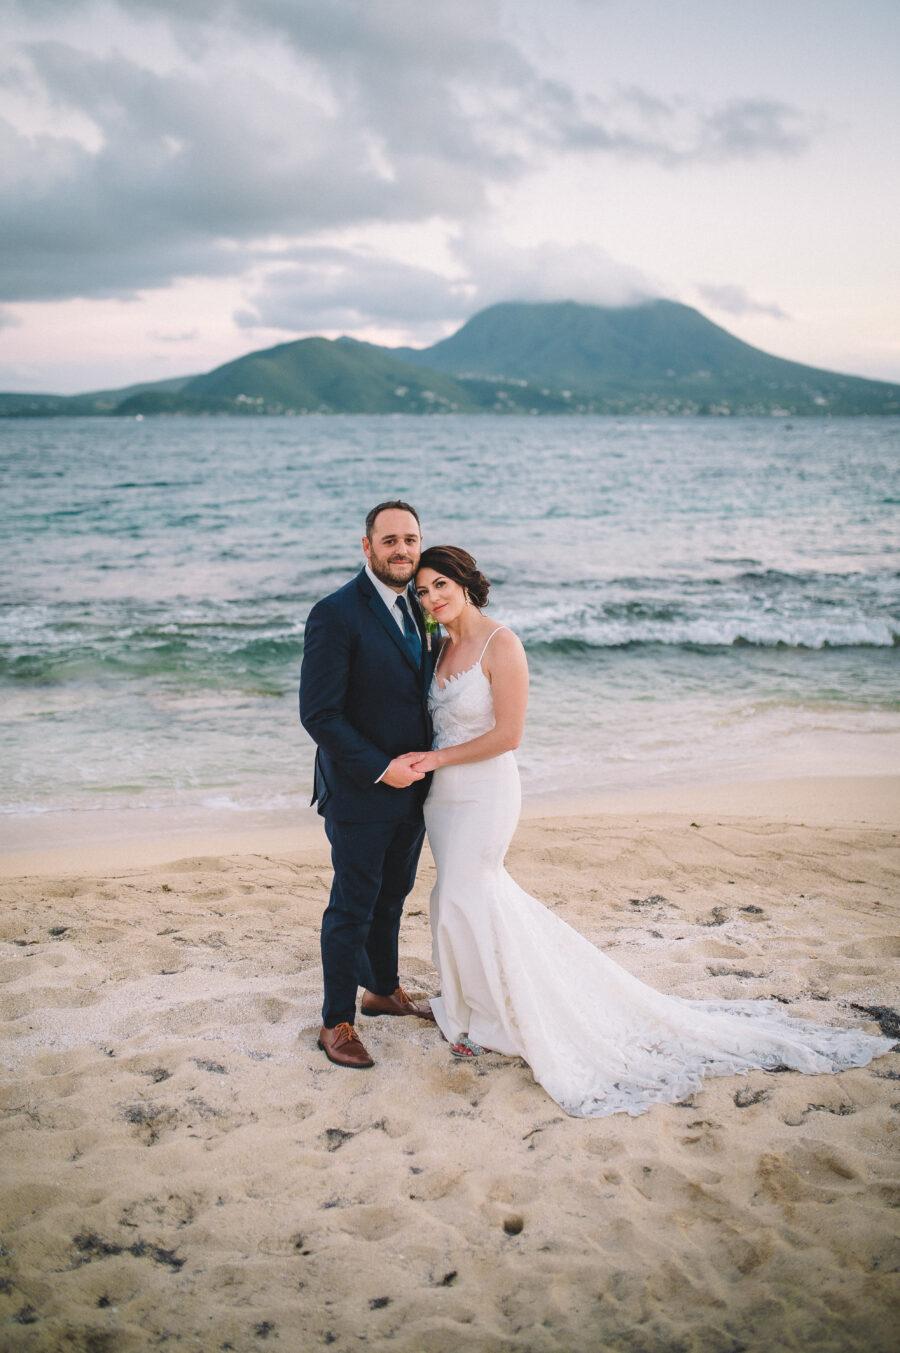 Caribbean Sea wedding photo: Intimate Caribbean Wedding by Details Nashville